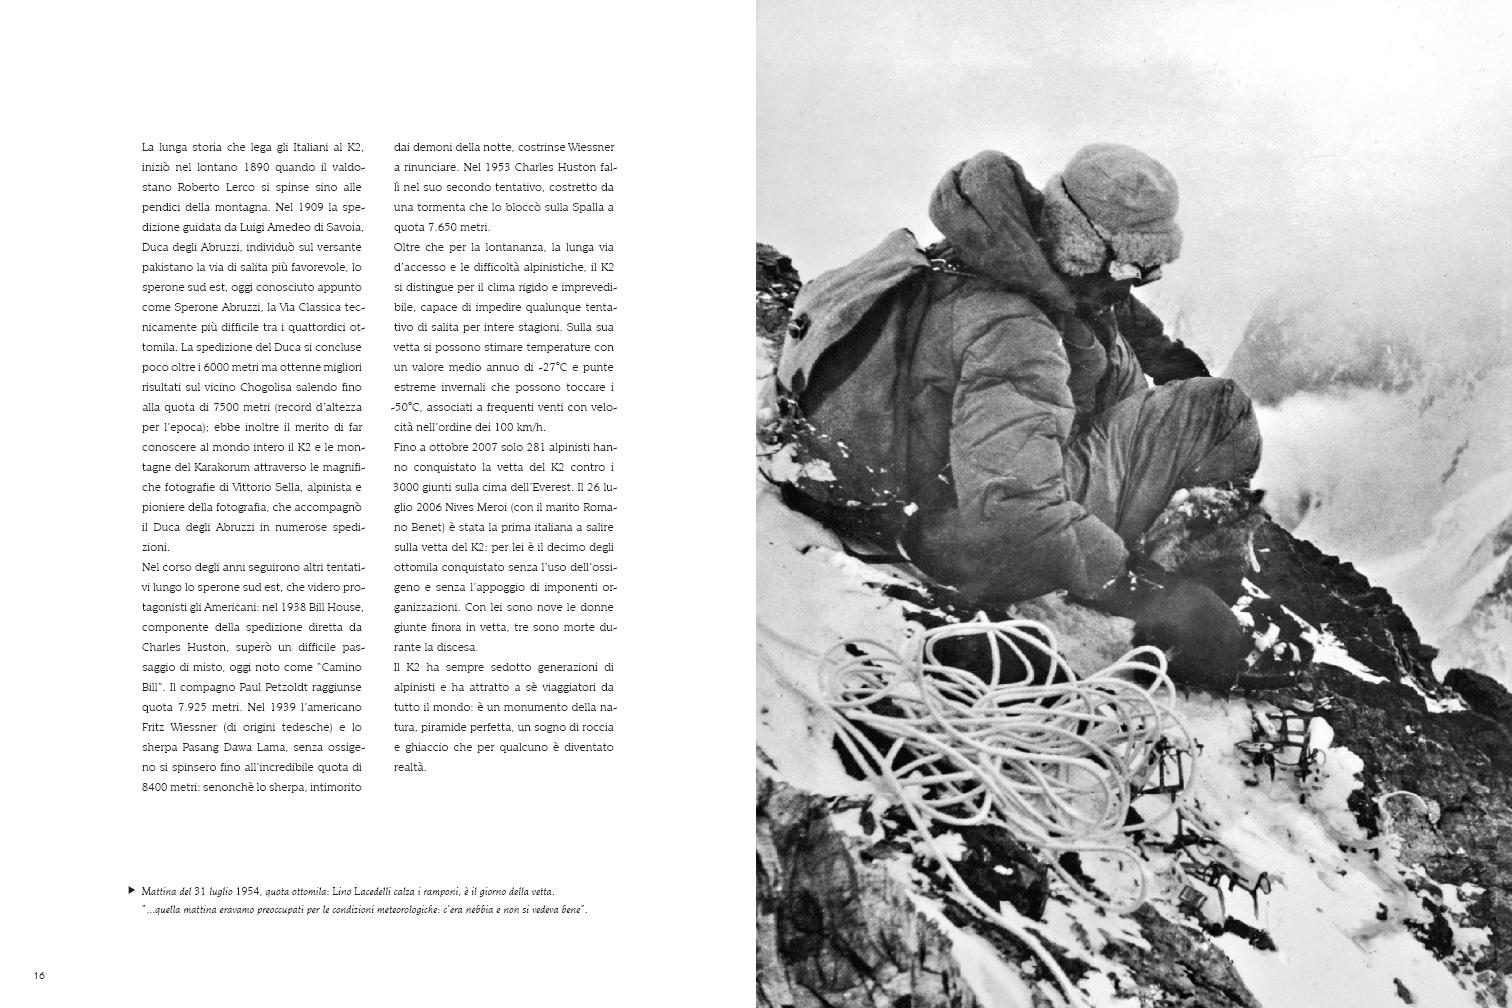 K2 EXPEDITION 1954-2004 Giuseppe Ghedina Fotografo - 010.jpg